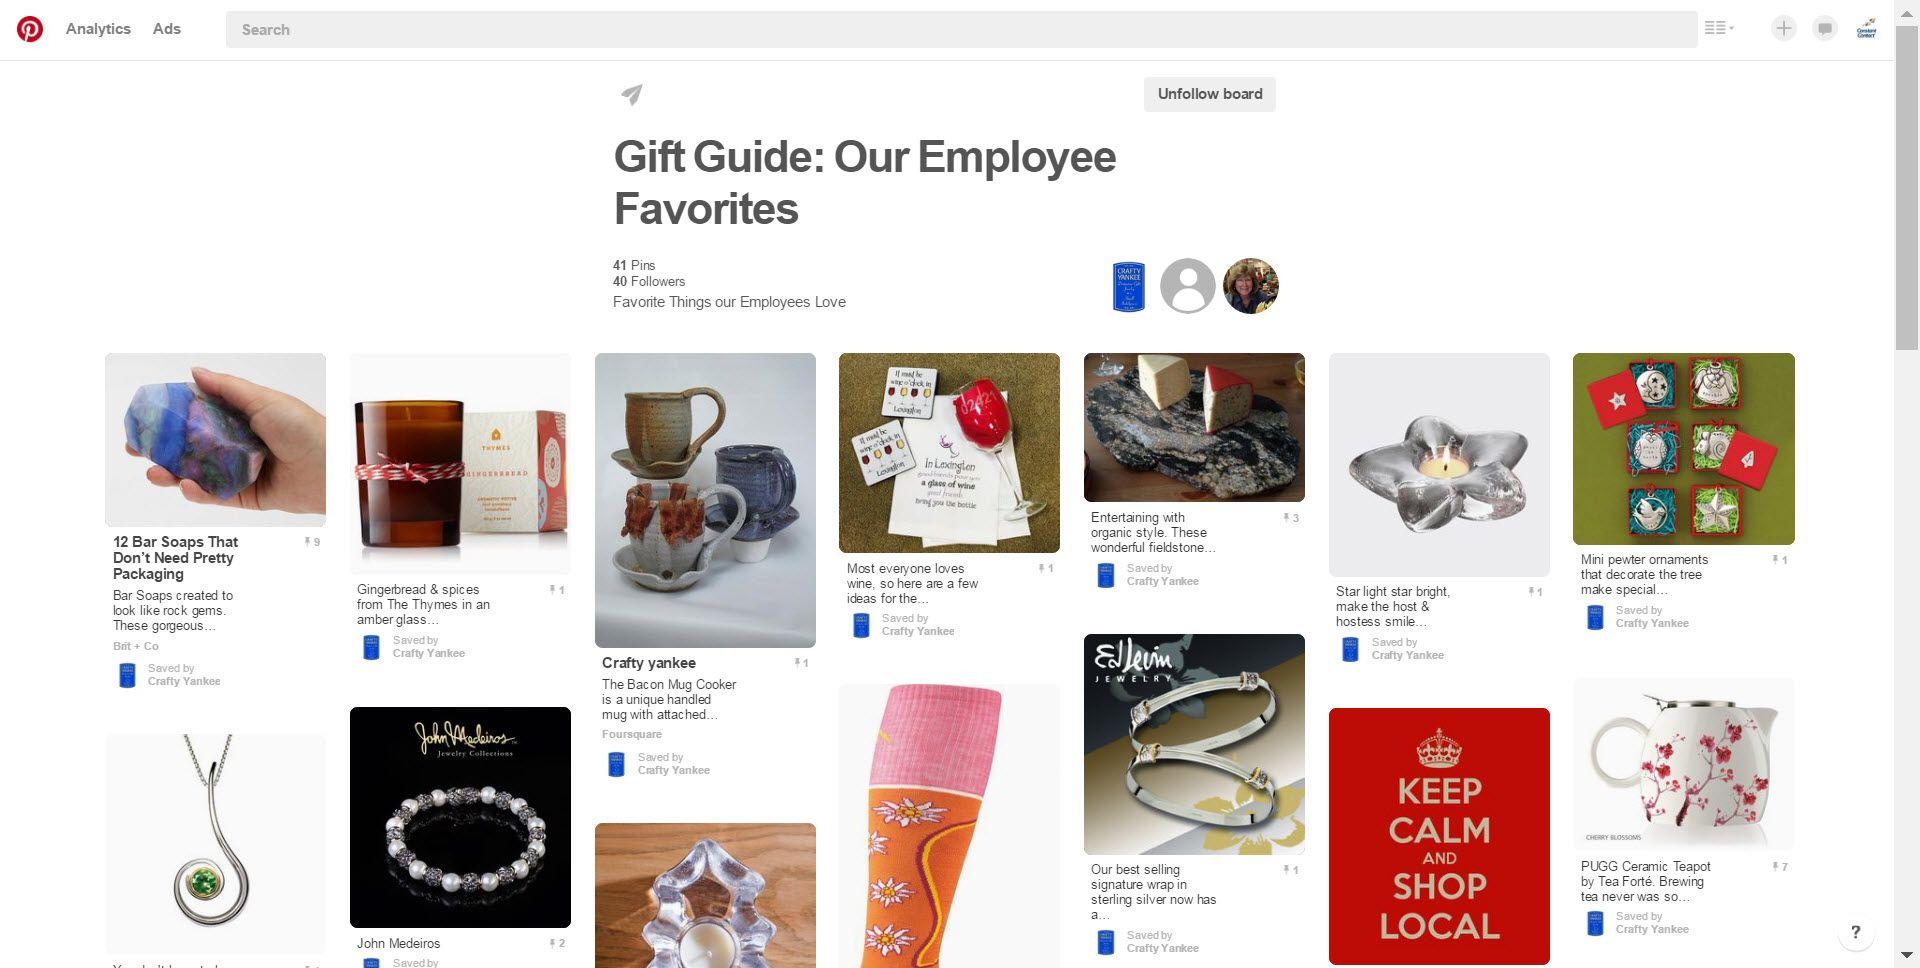 crafty-yankee-pinterest-gift-guide